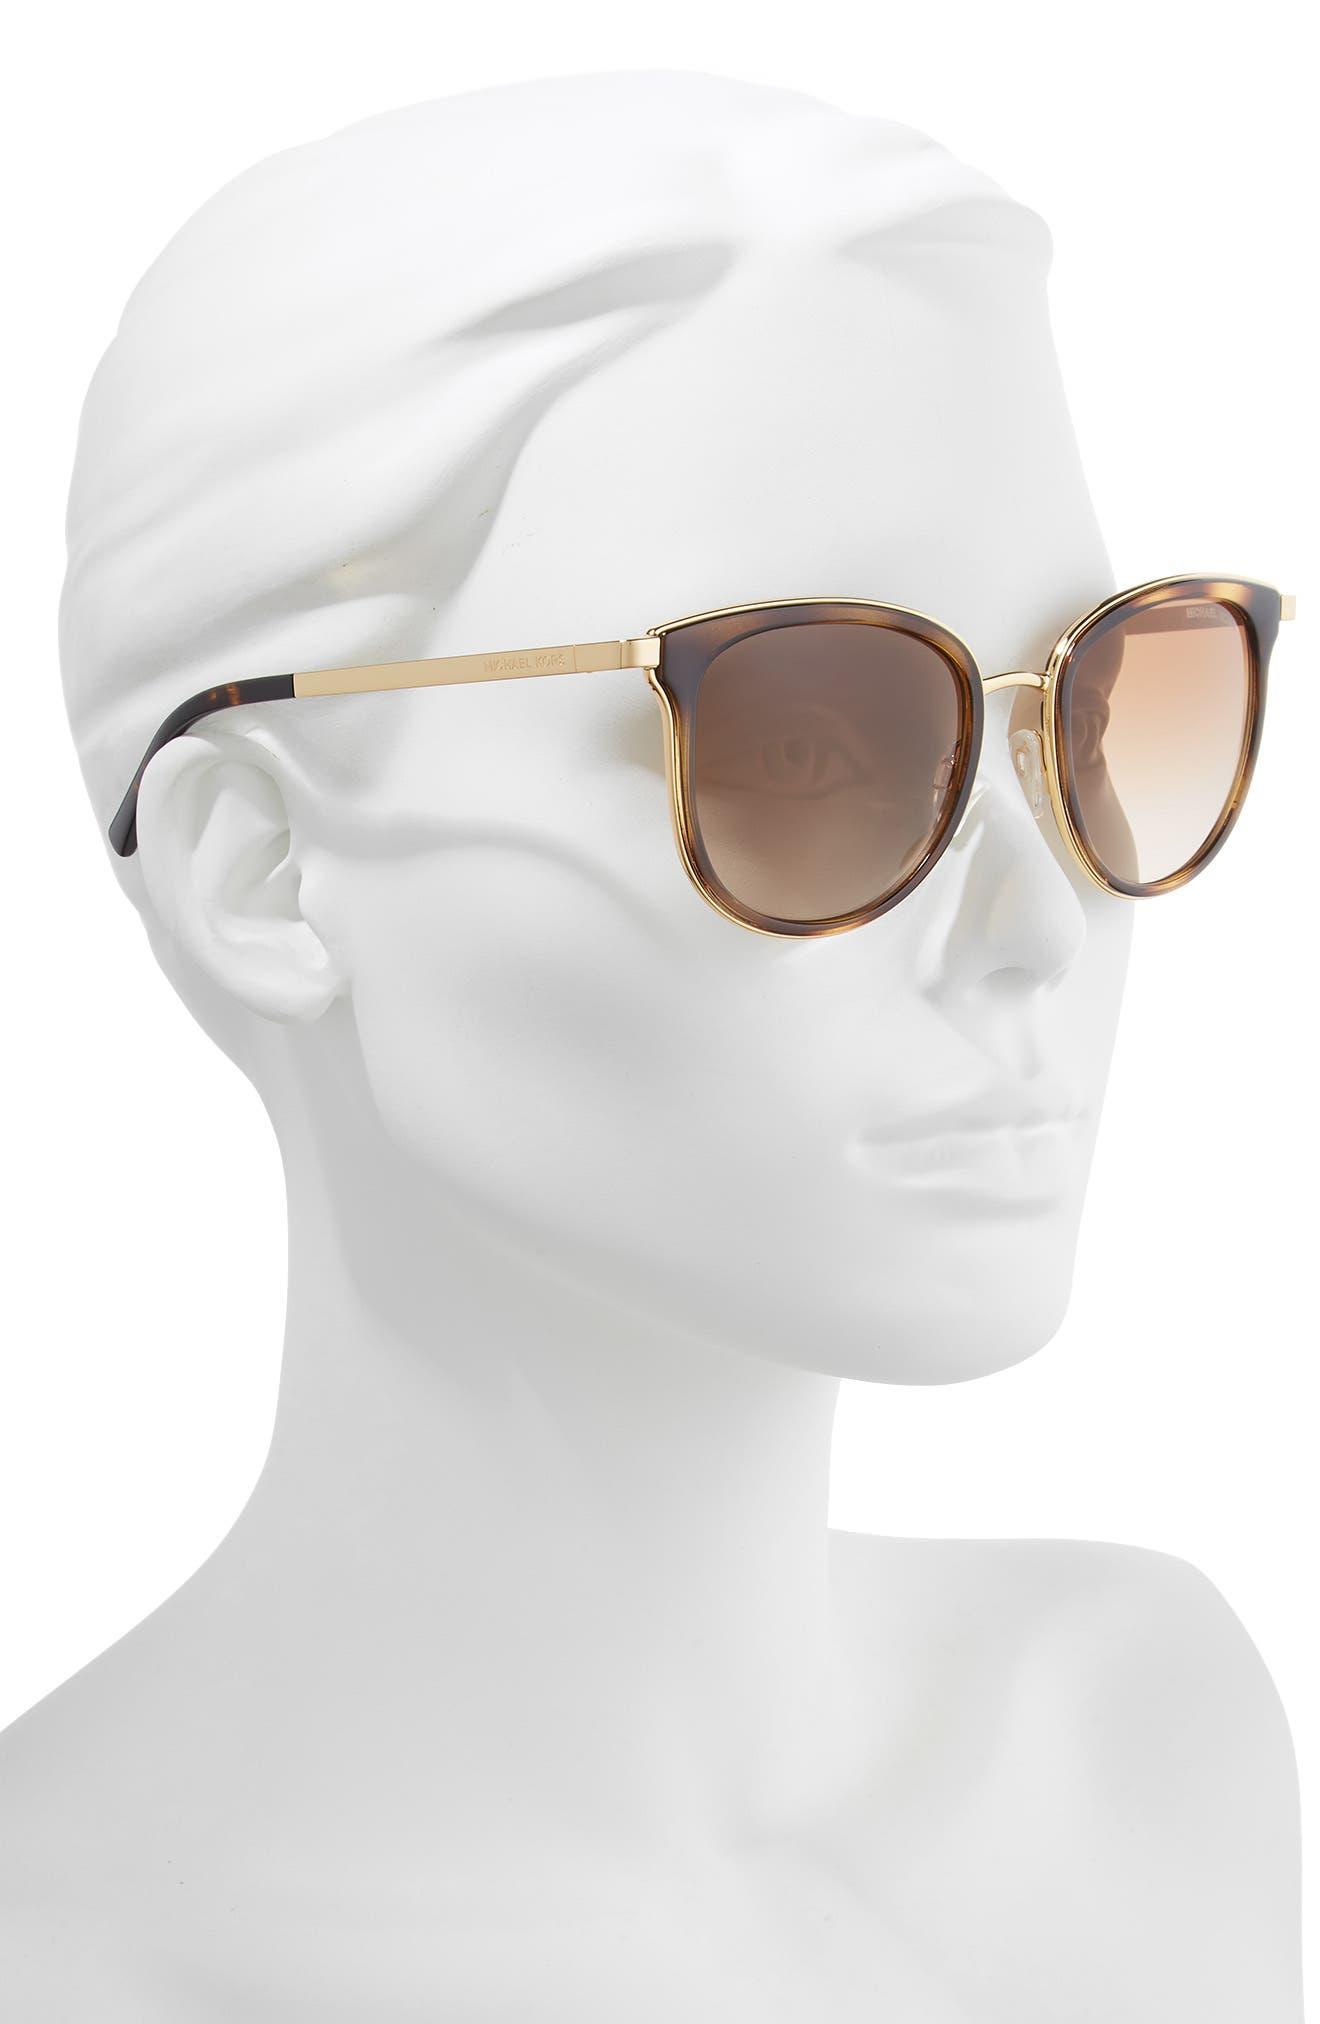 54mm Round Sunglasses,                             Alternate thumbnail 2, color,                             200